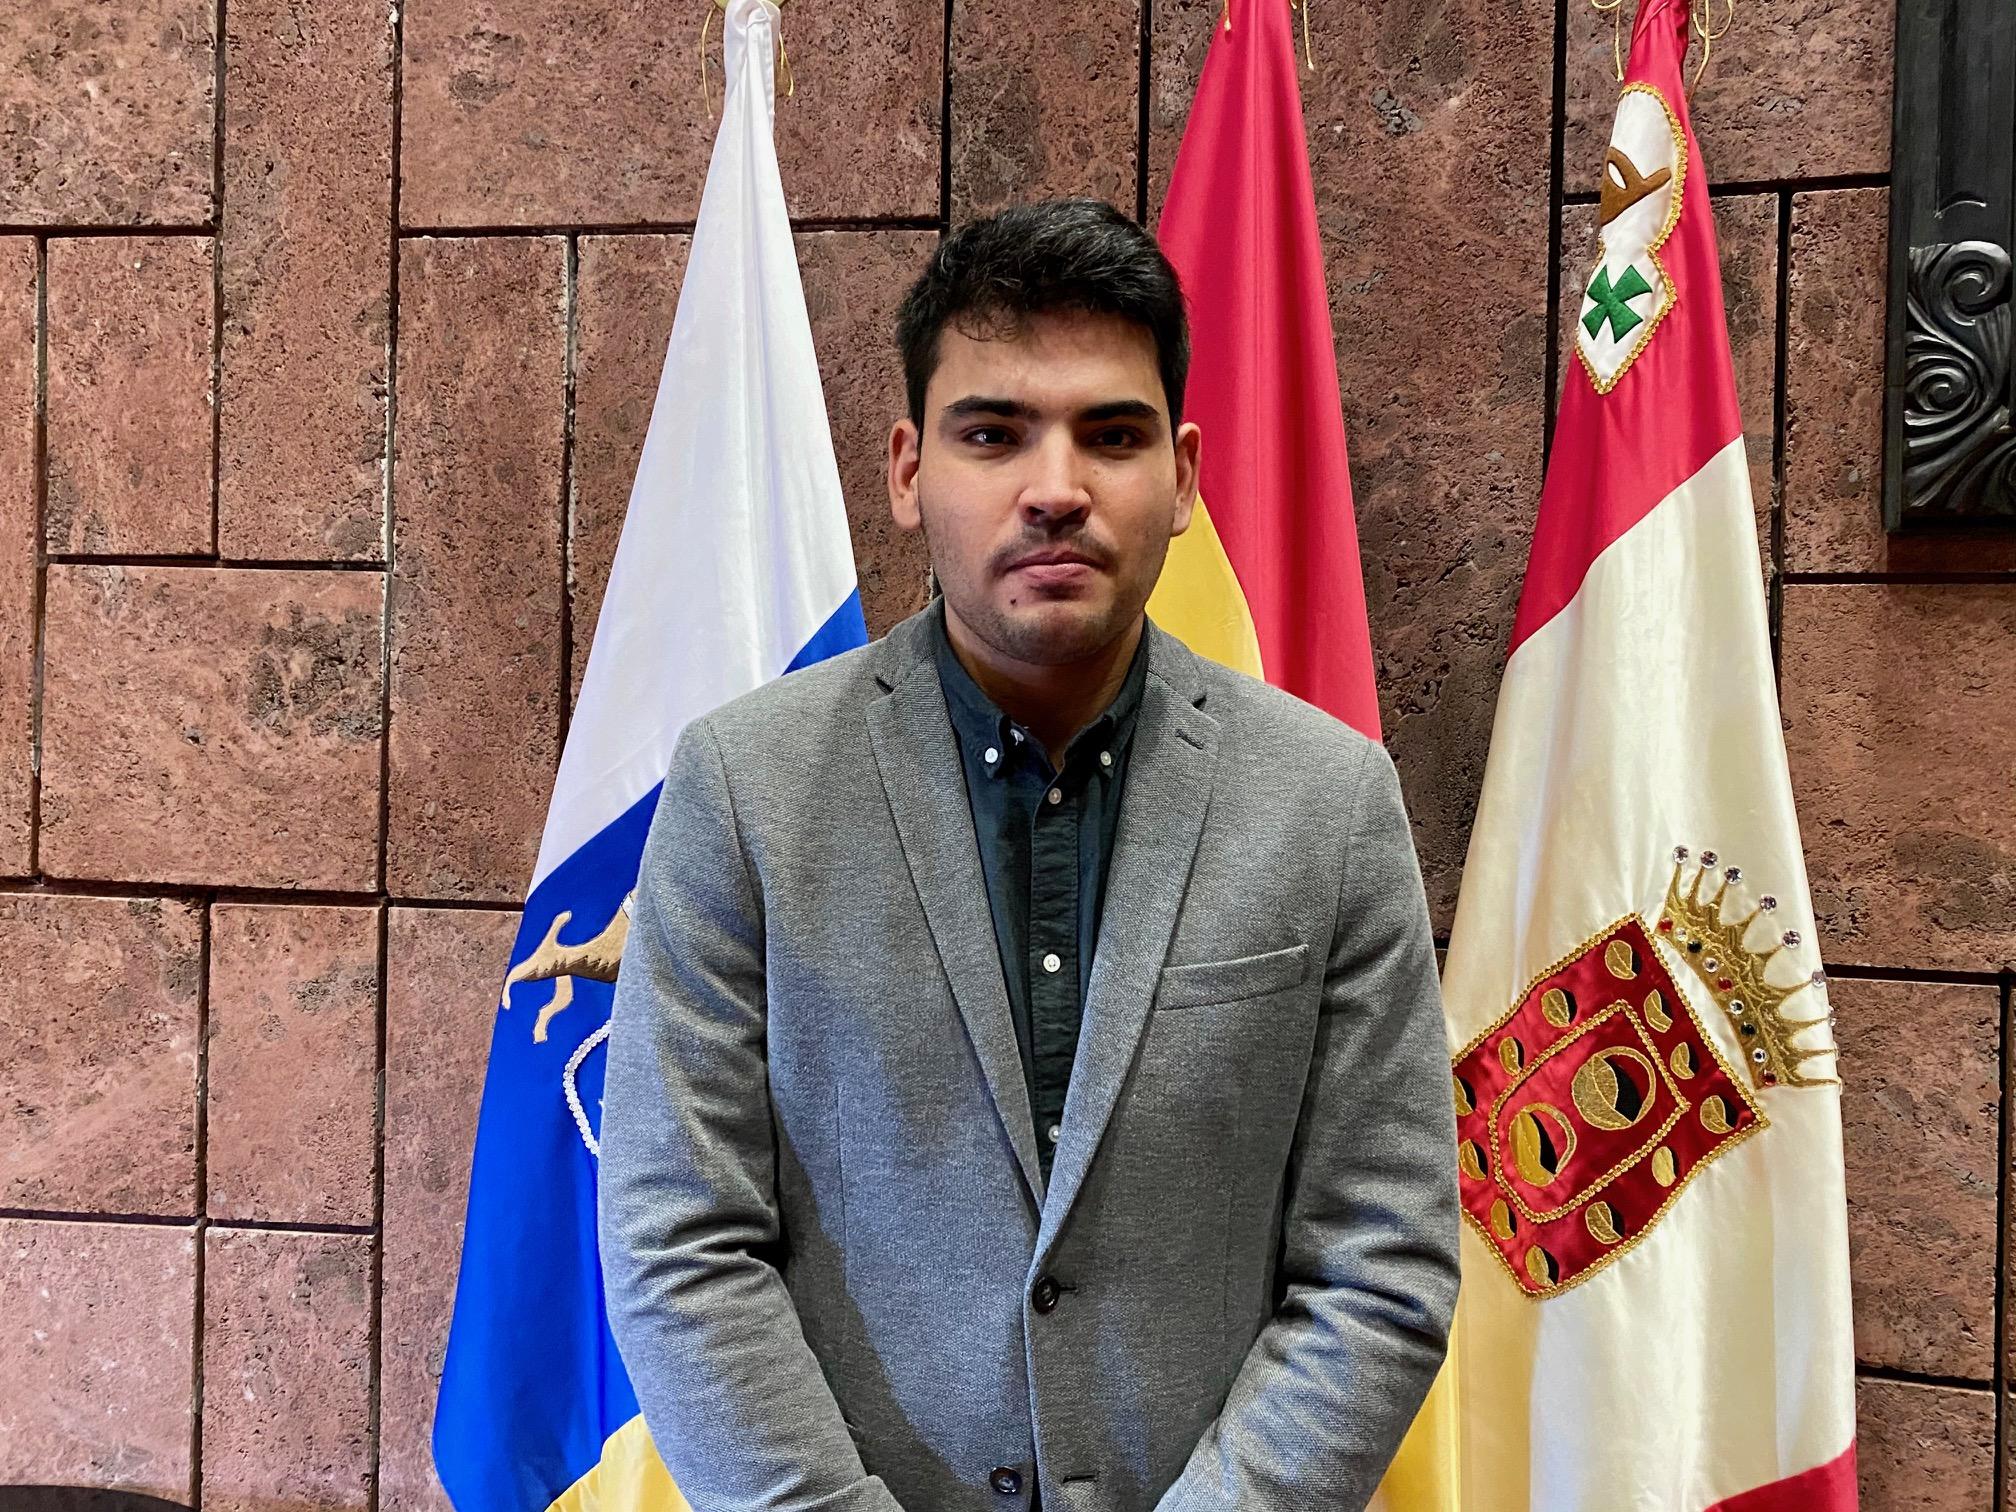 Aarón Rodríguez Ramos